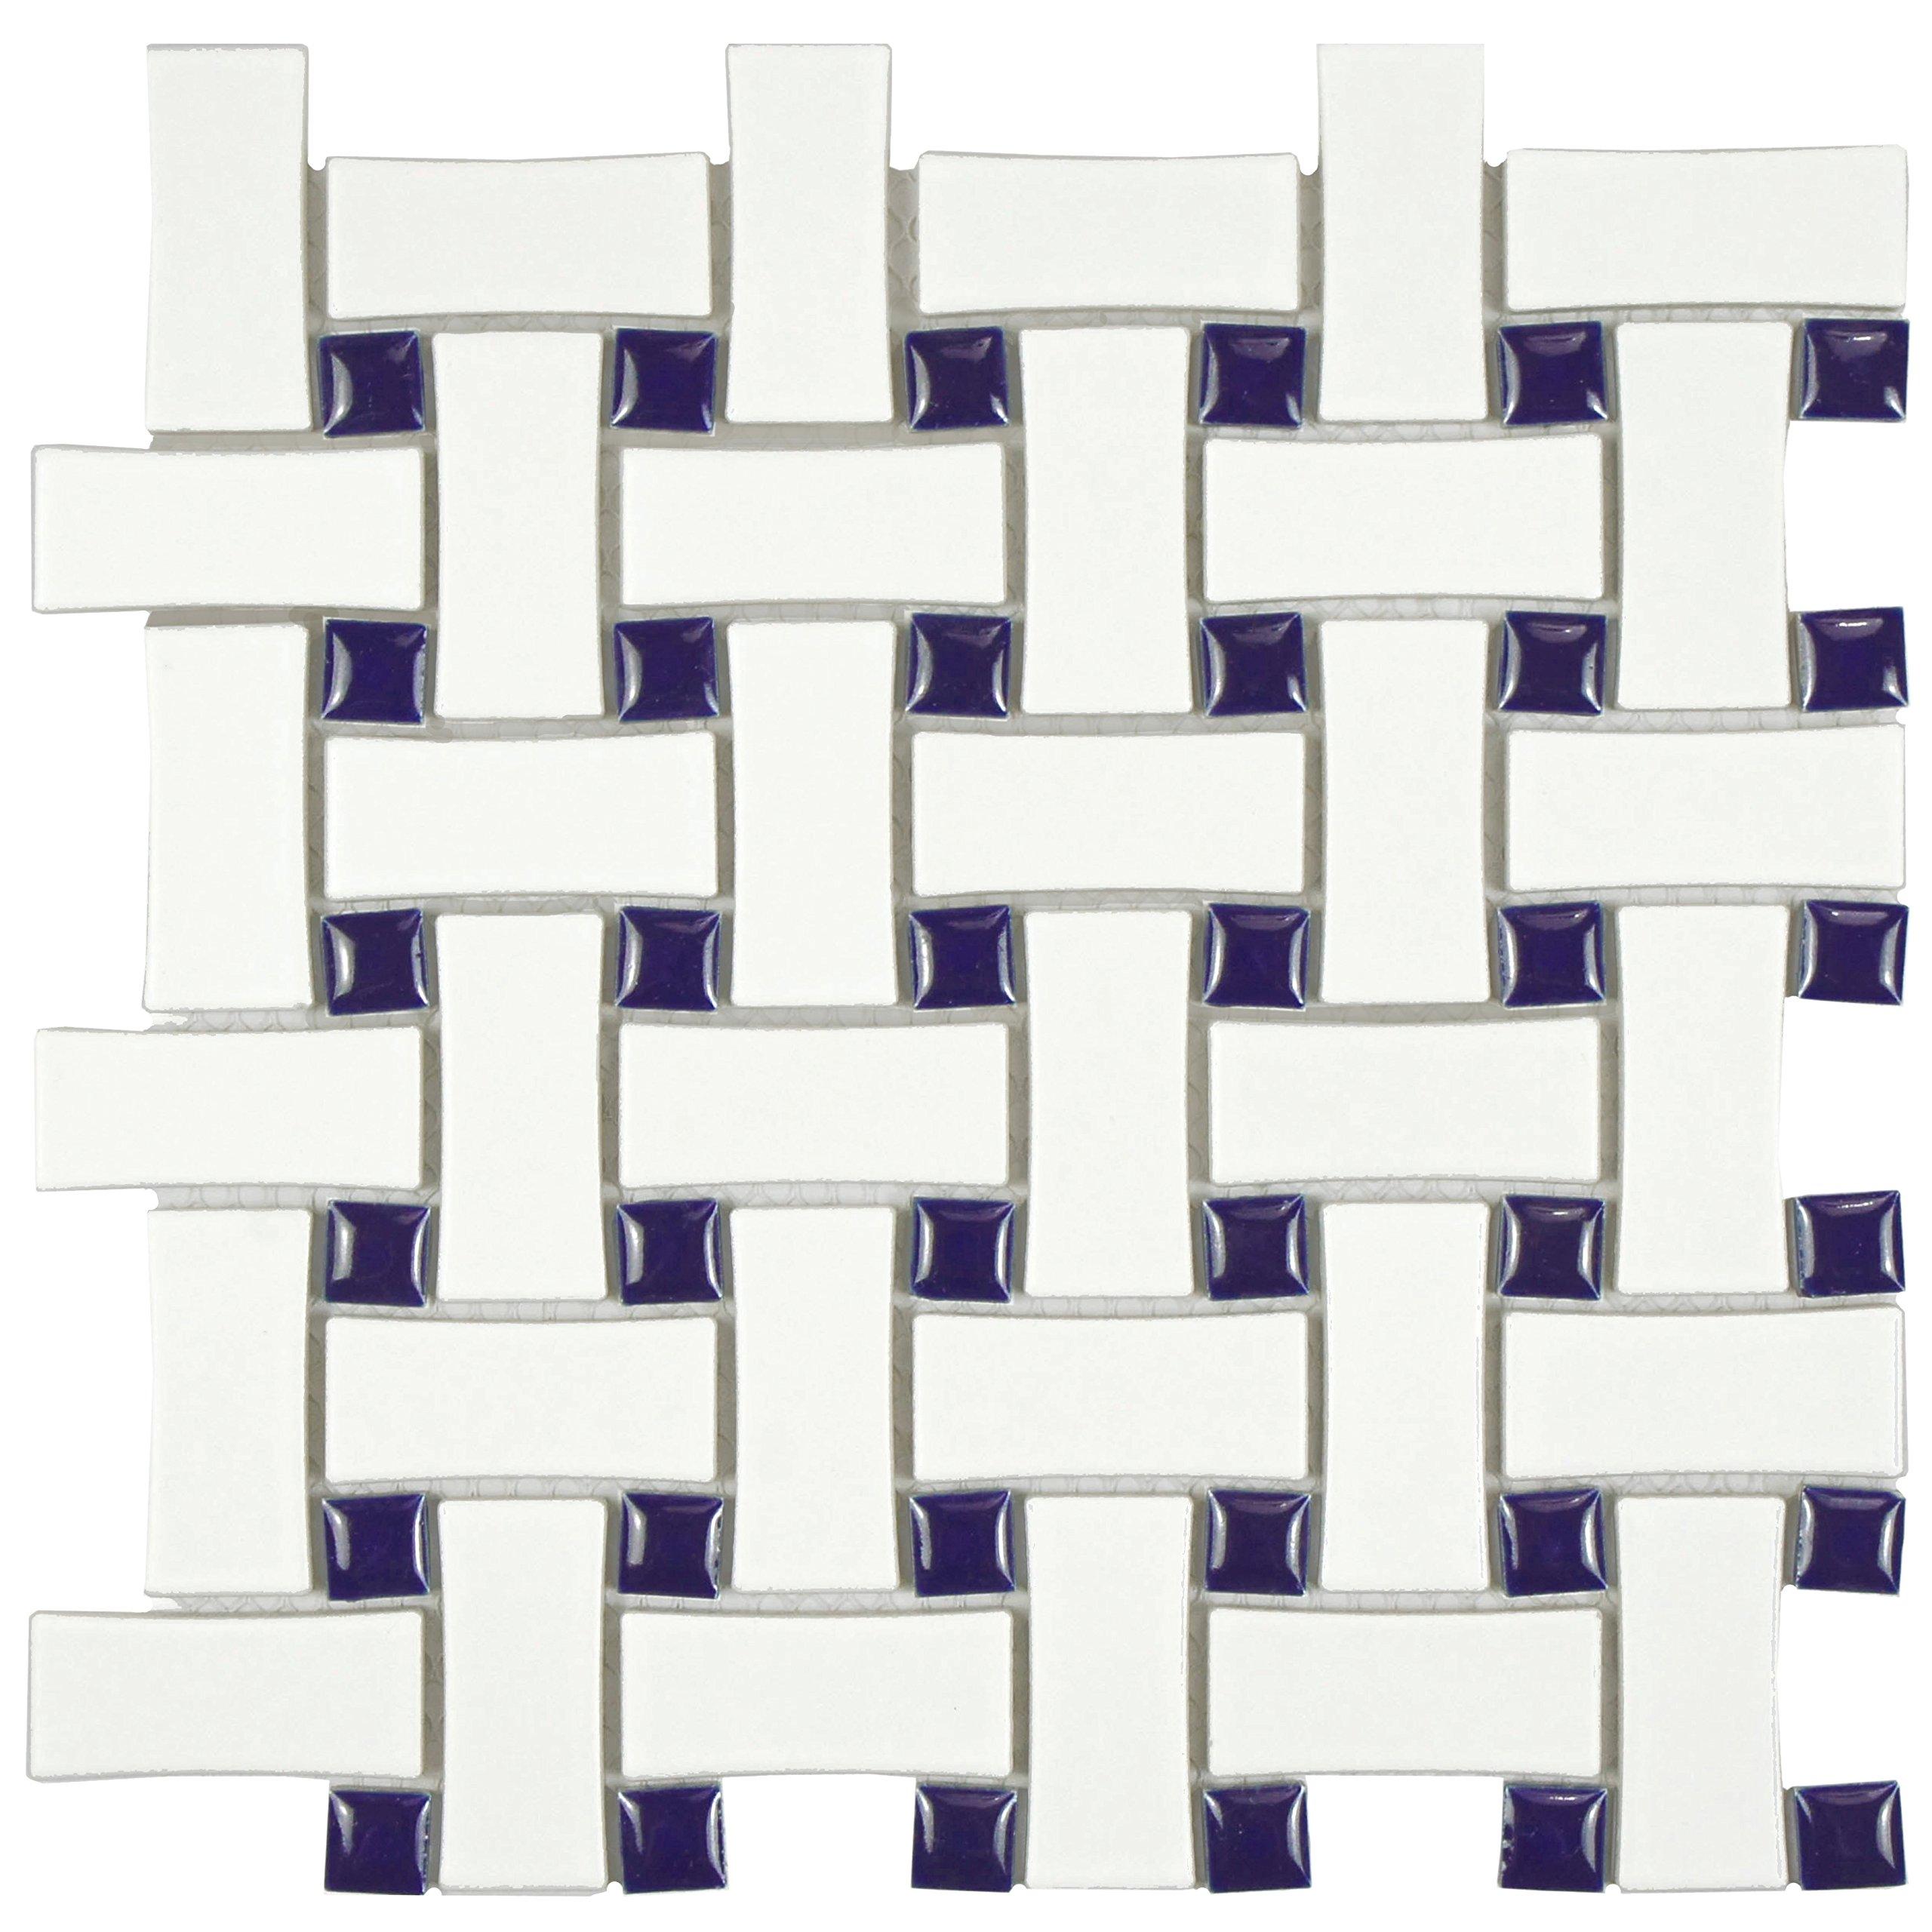 SomerTile FDXMBWWC Retro Basket Weave Glazed Porcelain Mosaic Floor and Wall Tile, 10.5'' x 10.5'', Matte White/Cobalt